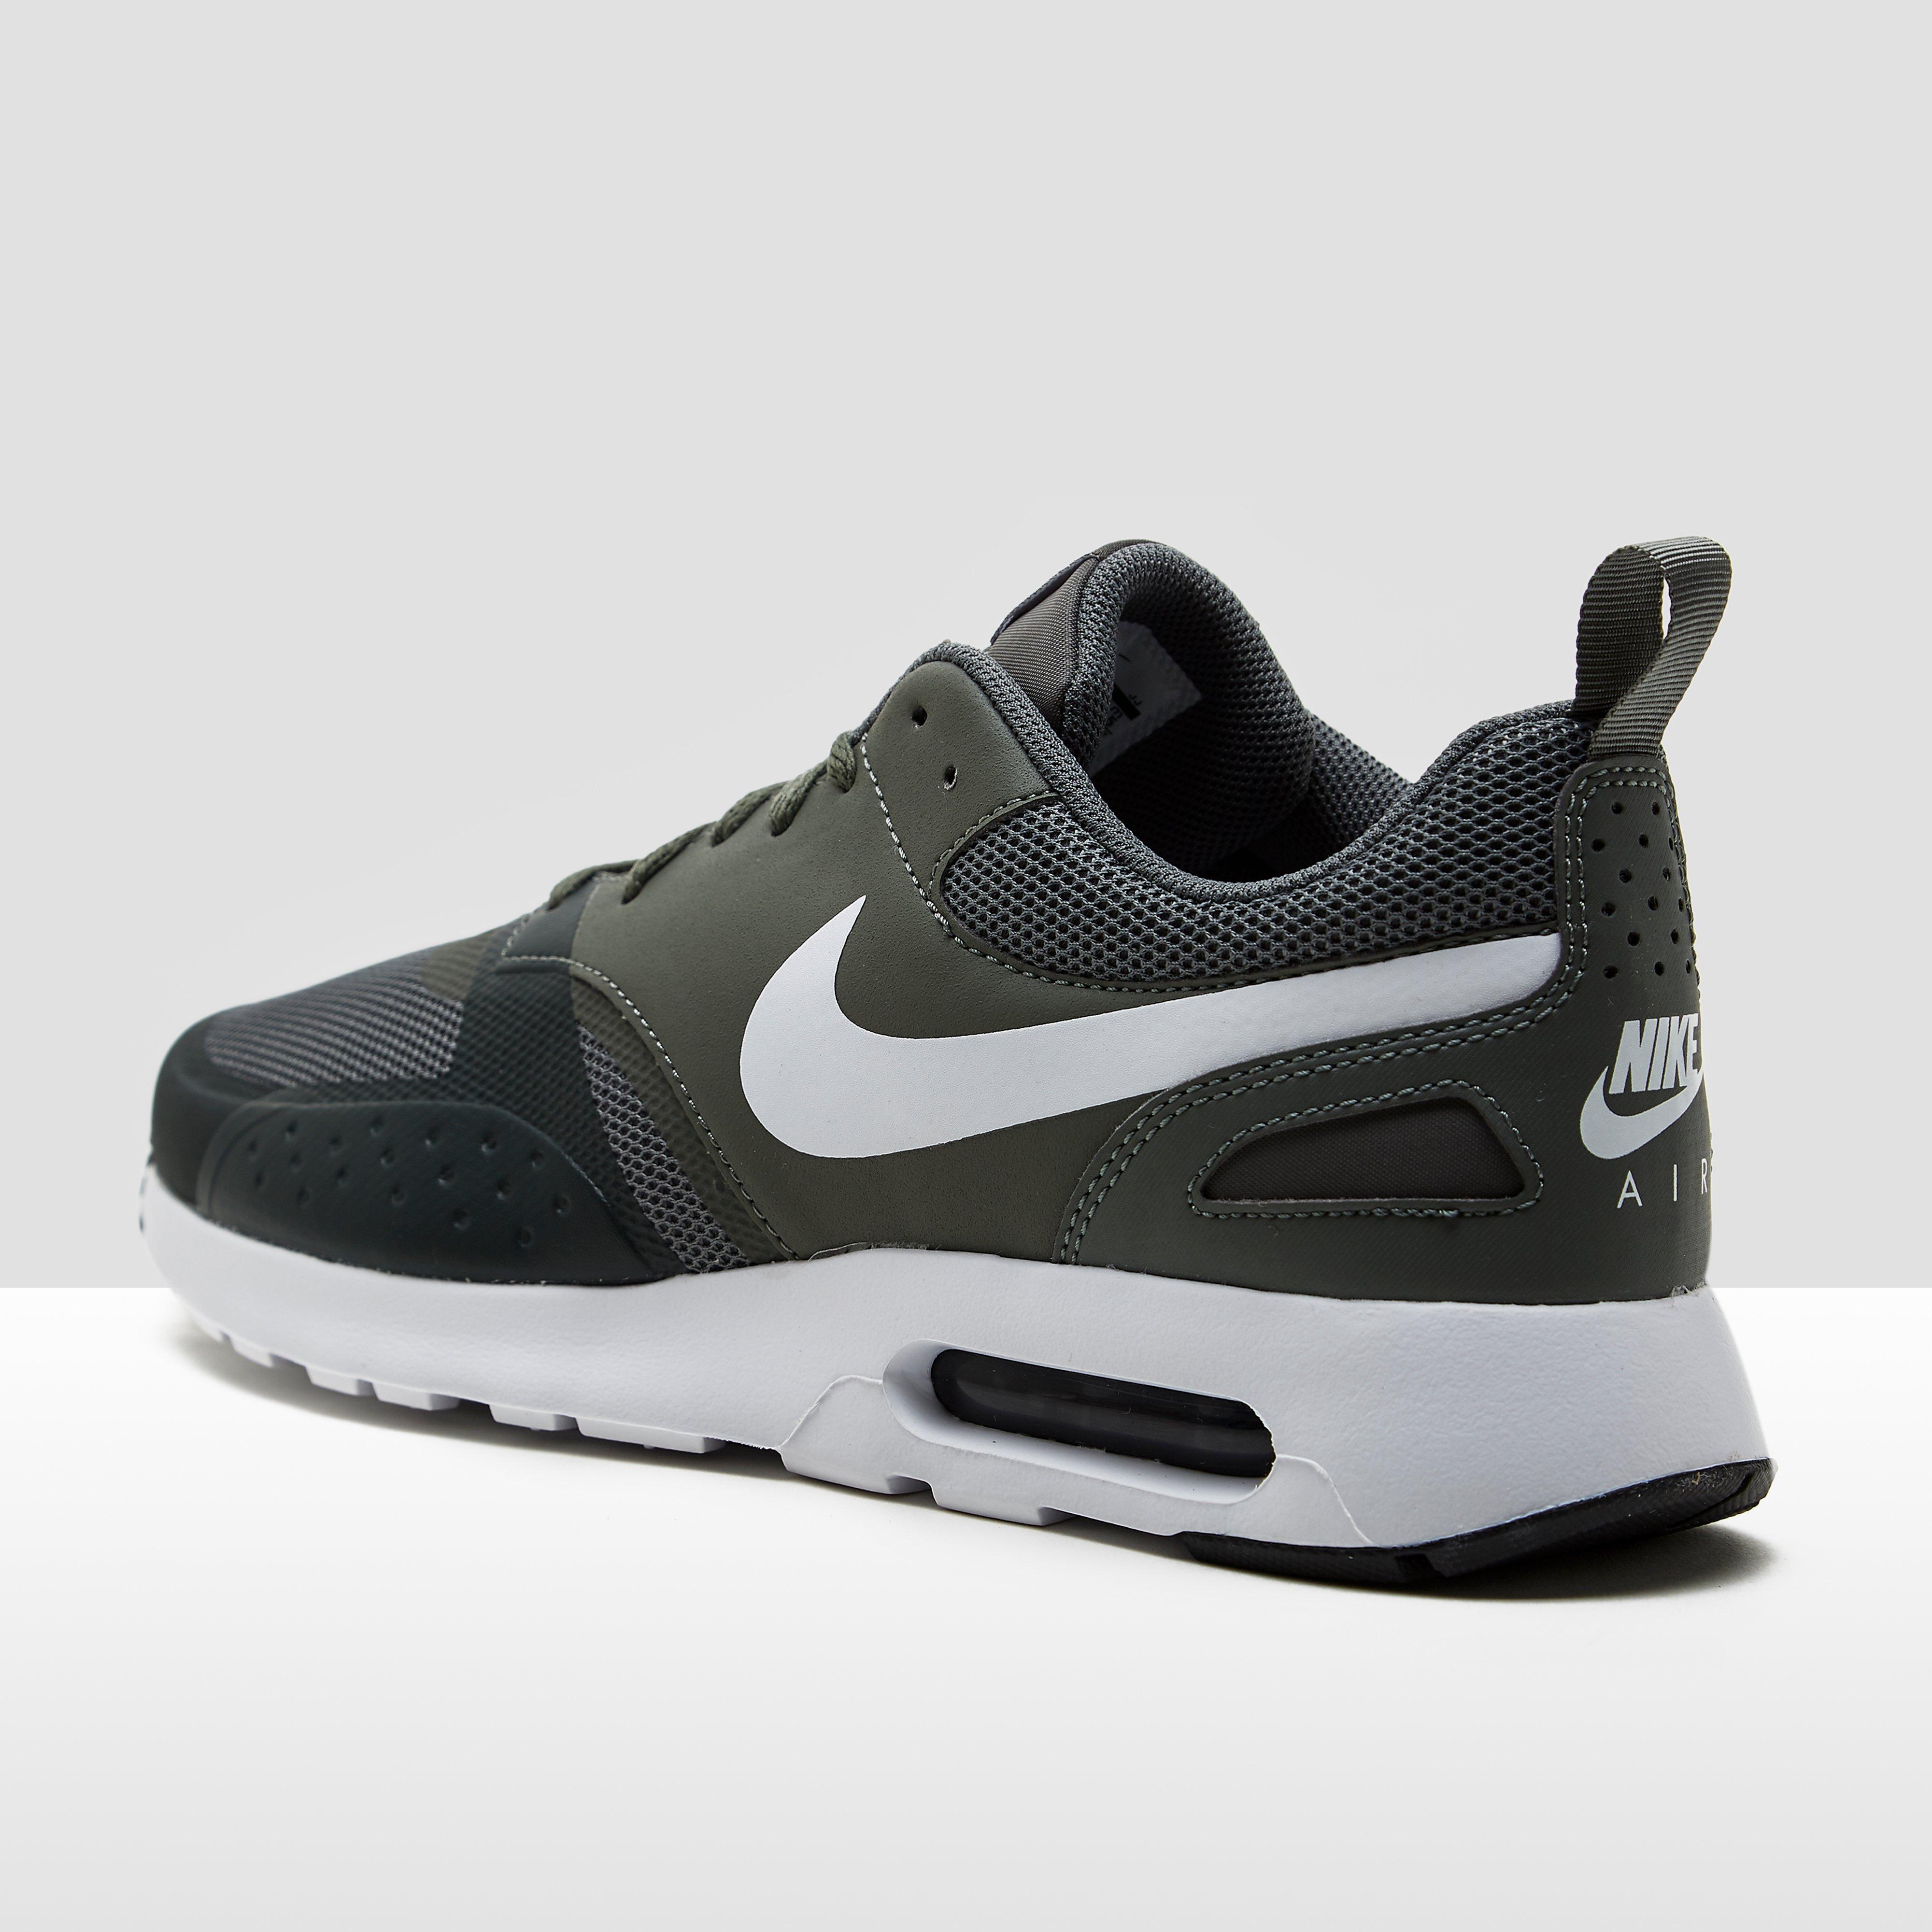 Nike Vision Air Max - Vert / Gris dajdSWE